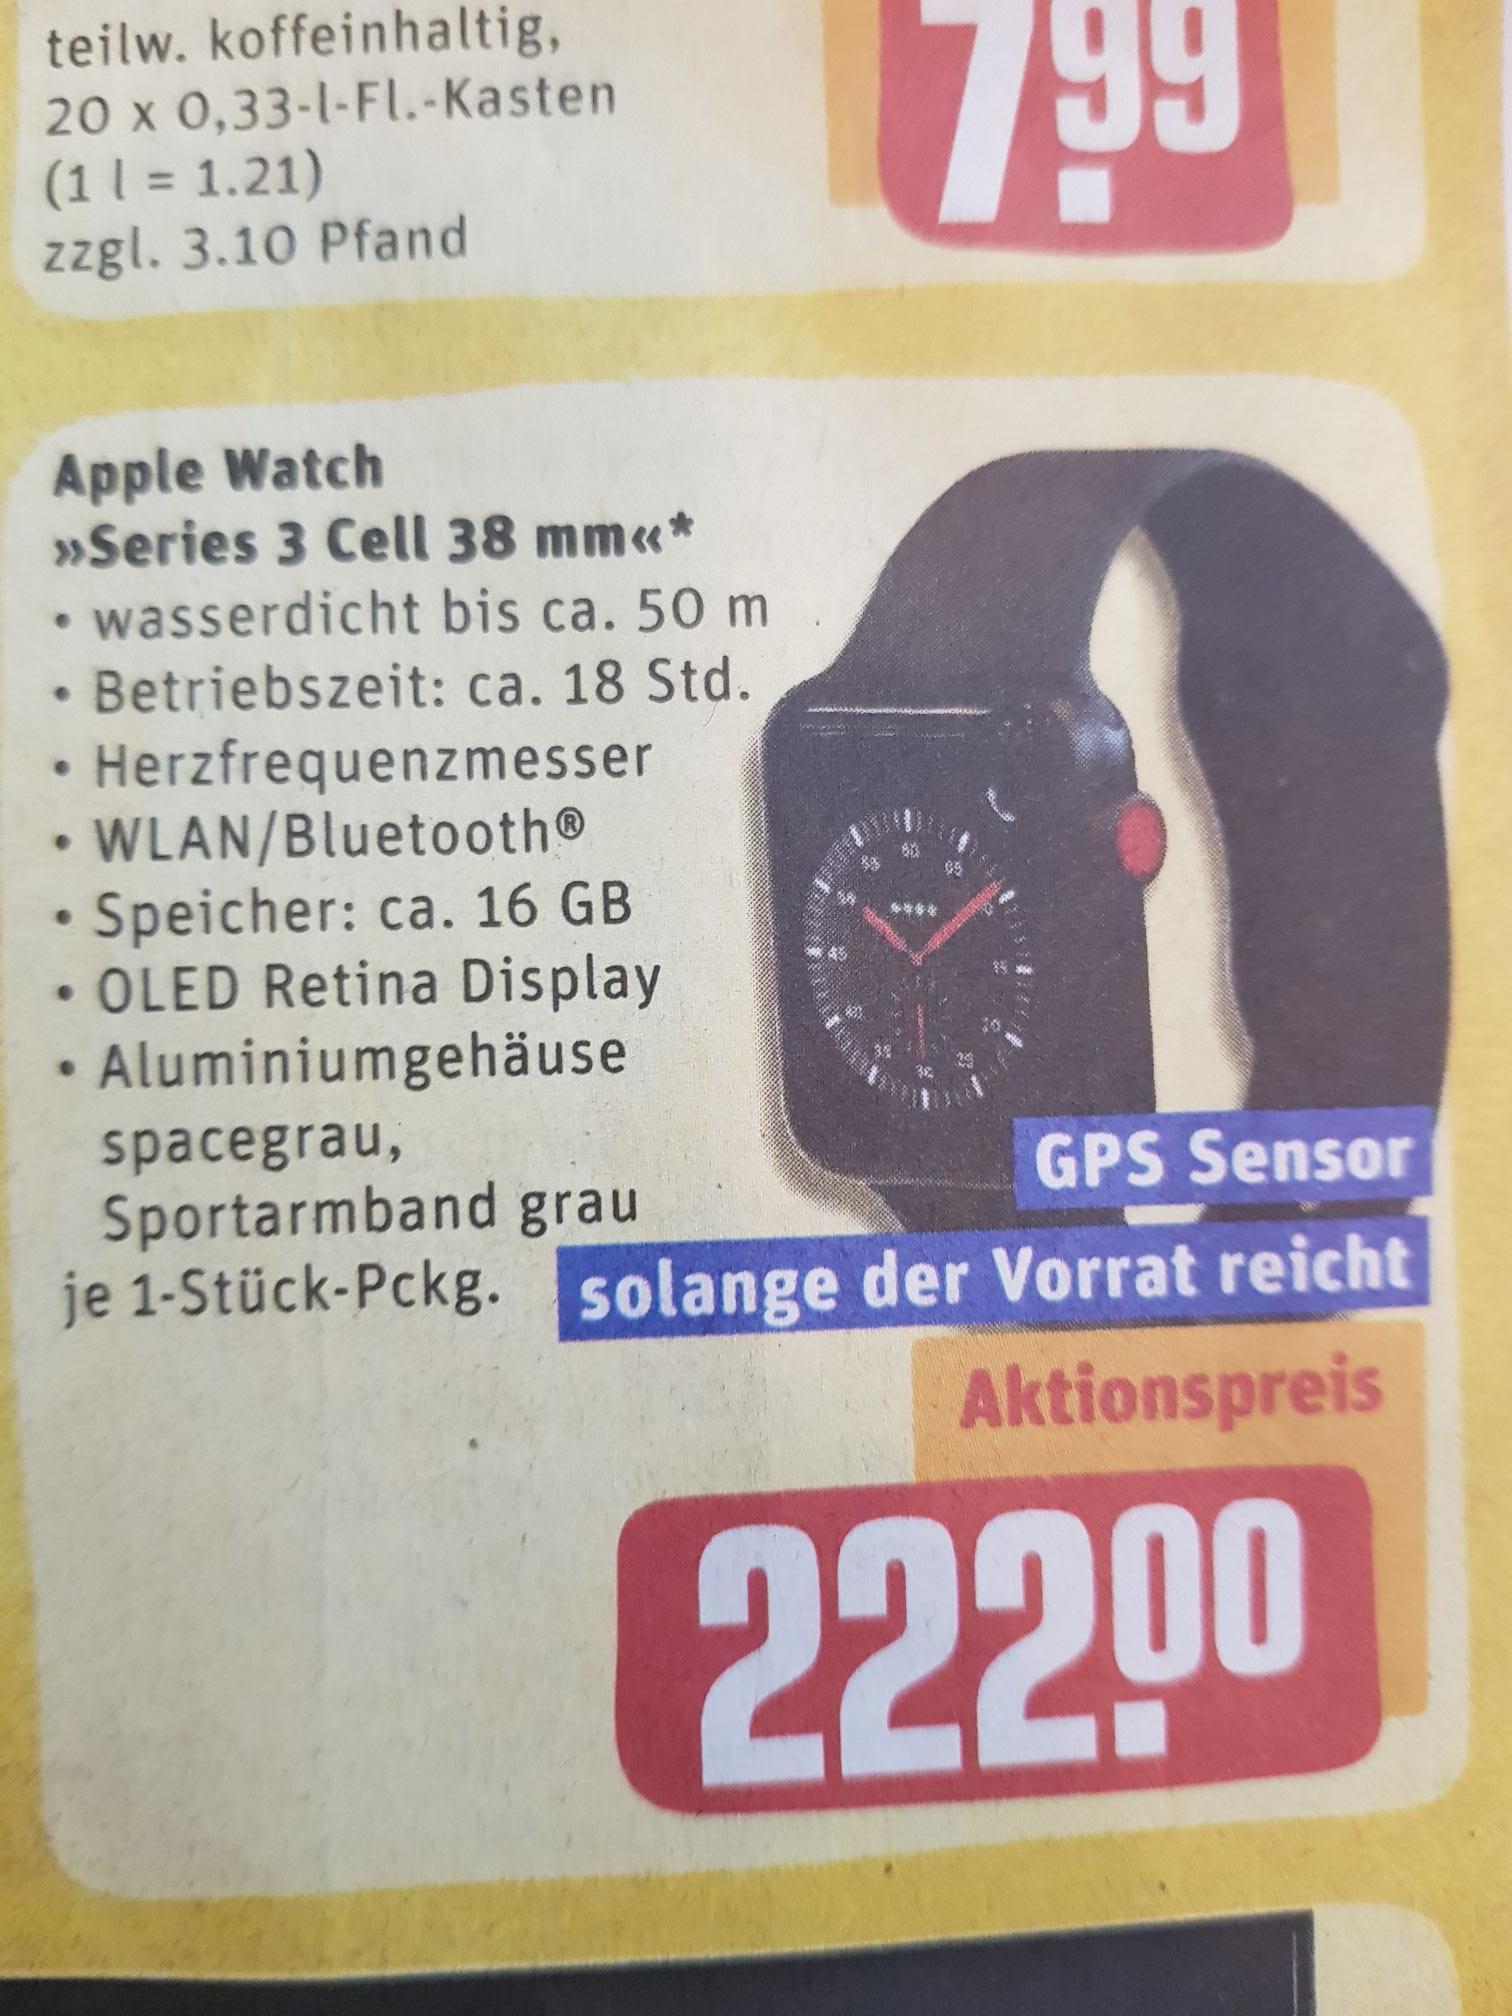 [Lokal, Kall, Eifel] Apple Watch series 3, cellular 38mm